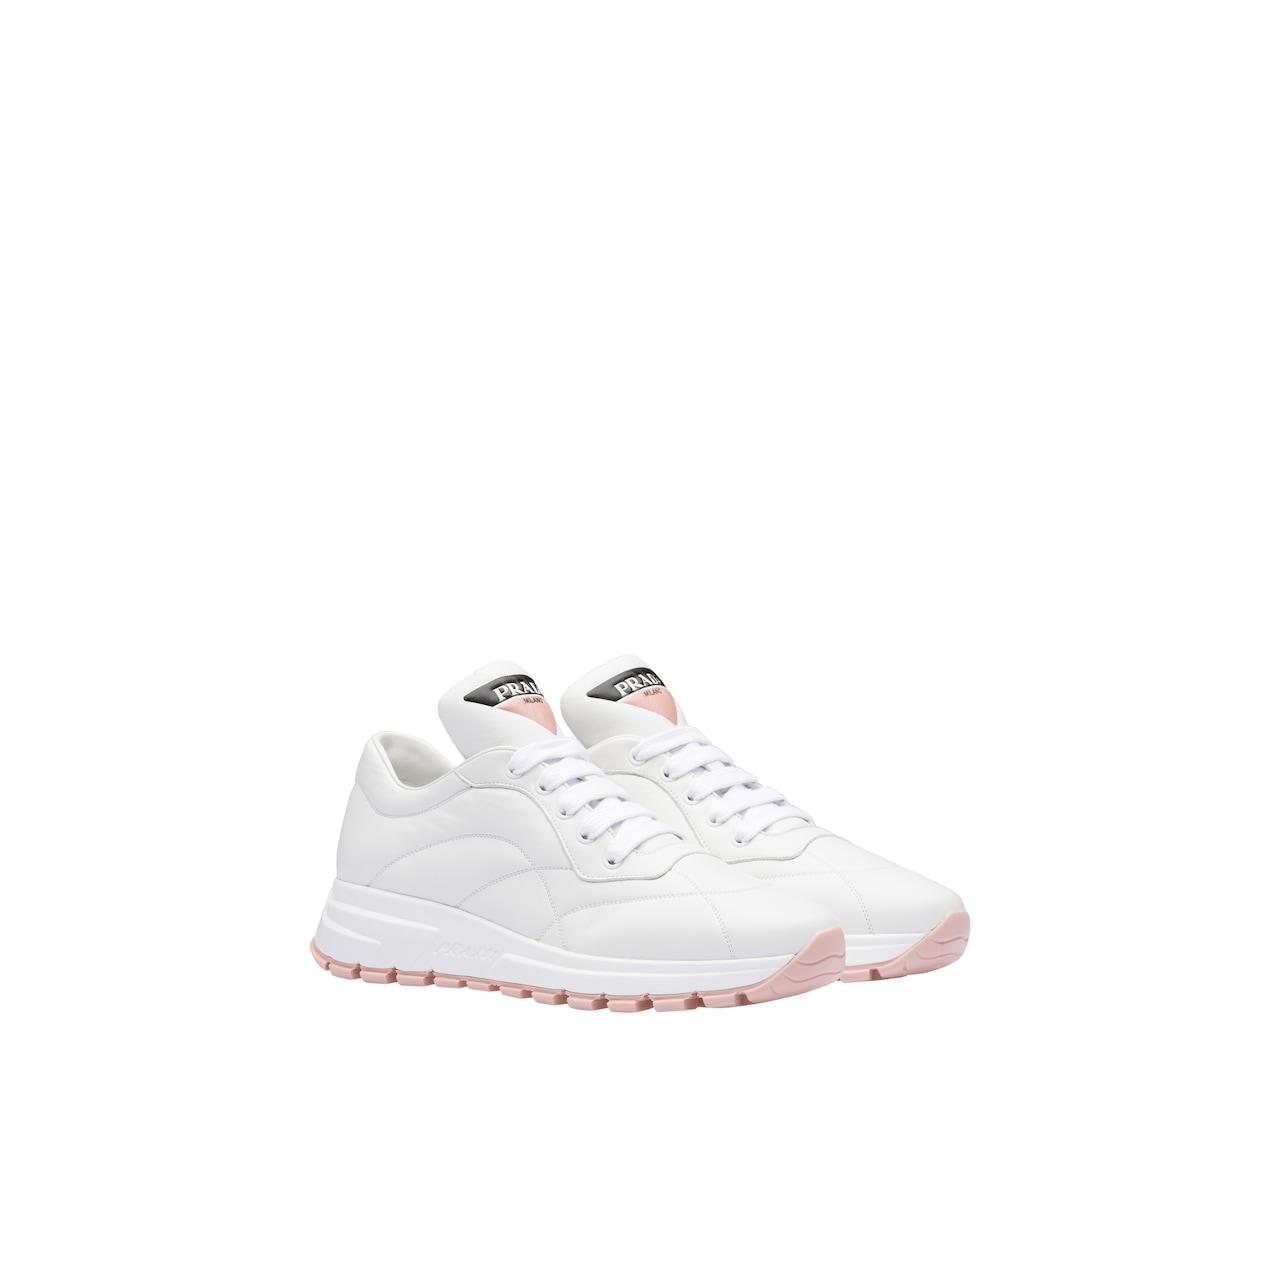 Prada PRAX 01 Nappa leather Sneakers 1